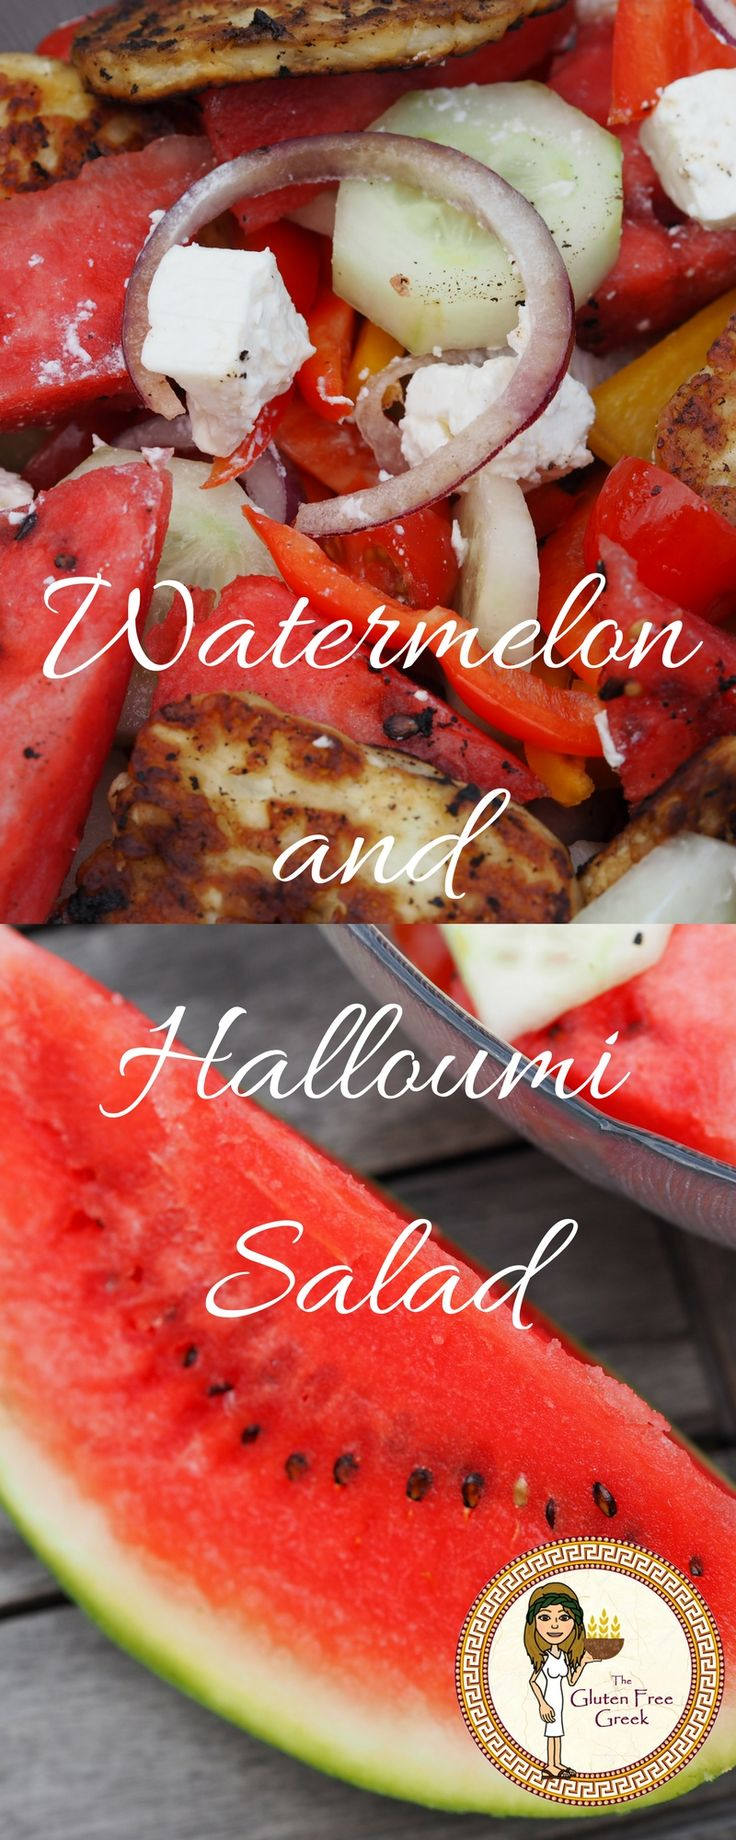 Watermelon and Halloumi Salad! Greek Style, Greek, Summer, Healthy